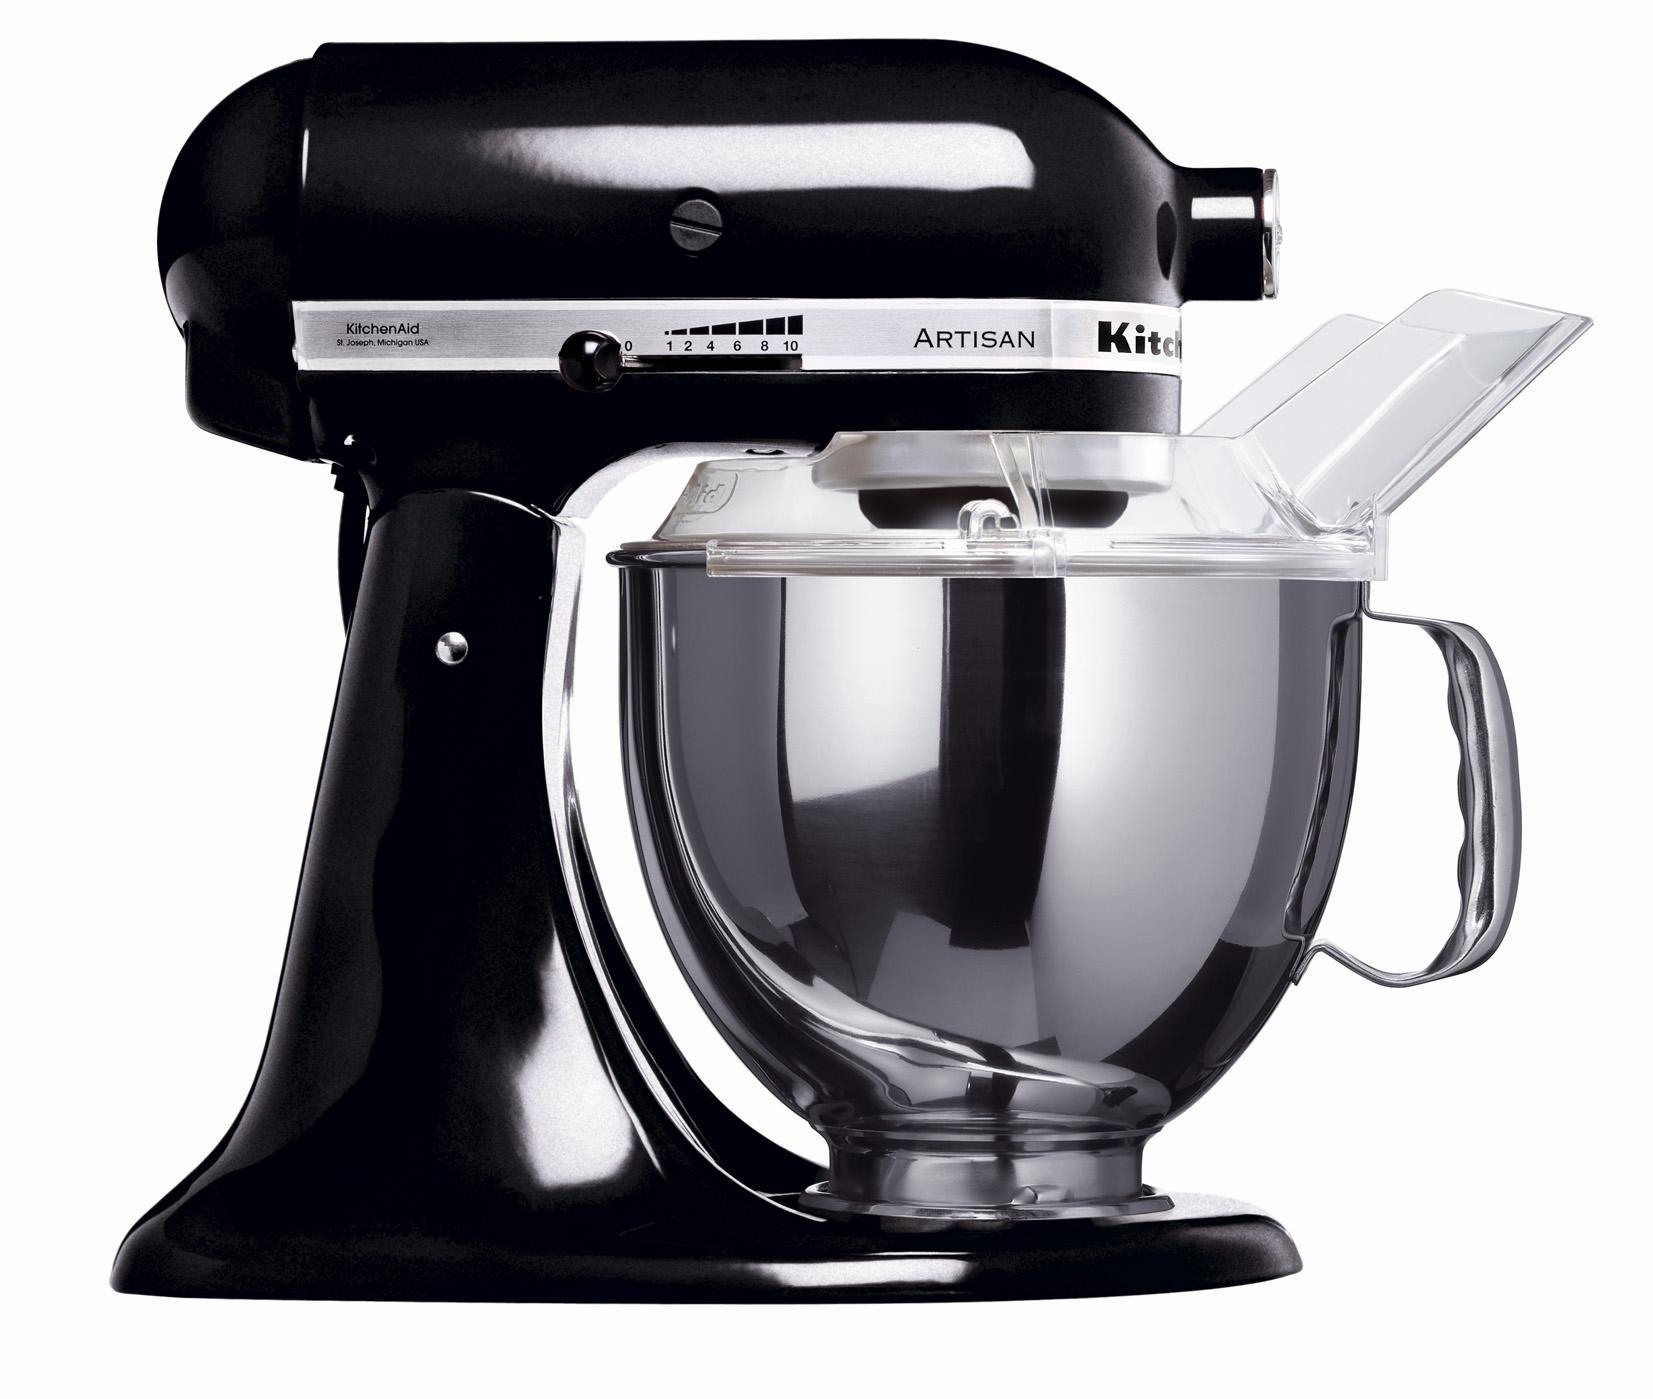 http://www.catalogomoda.com/fotos/kitchenaid-robot-de-cocina-artisan-negro-hnr:-5ksm150pseob-foto-117176.jpg